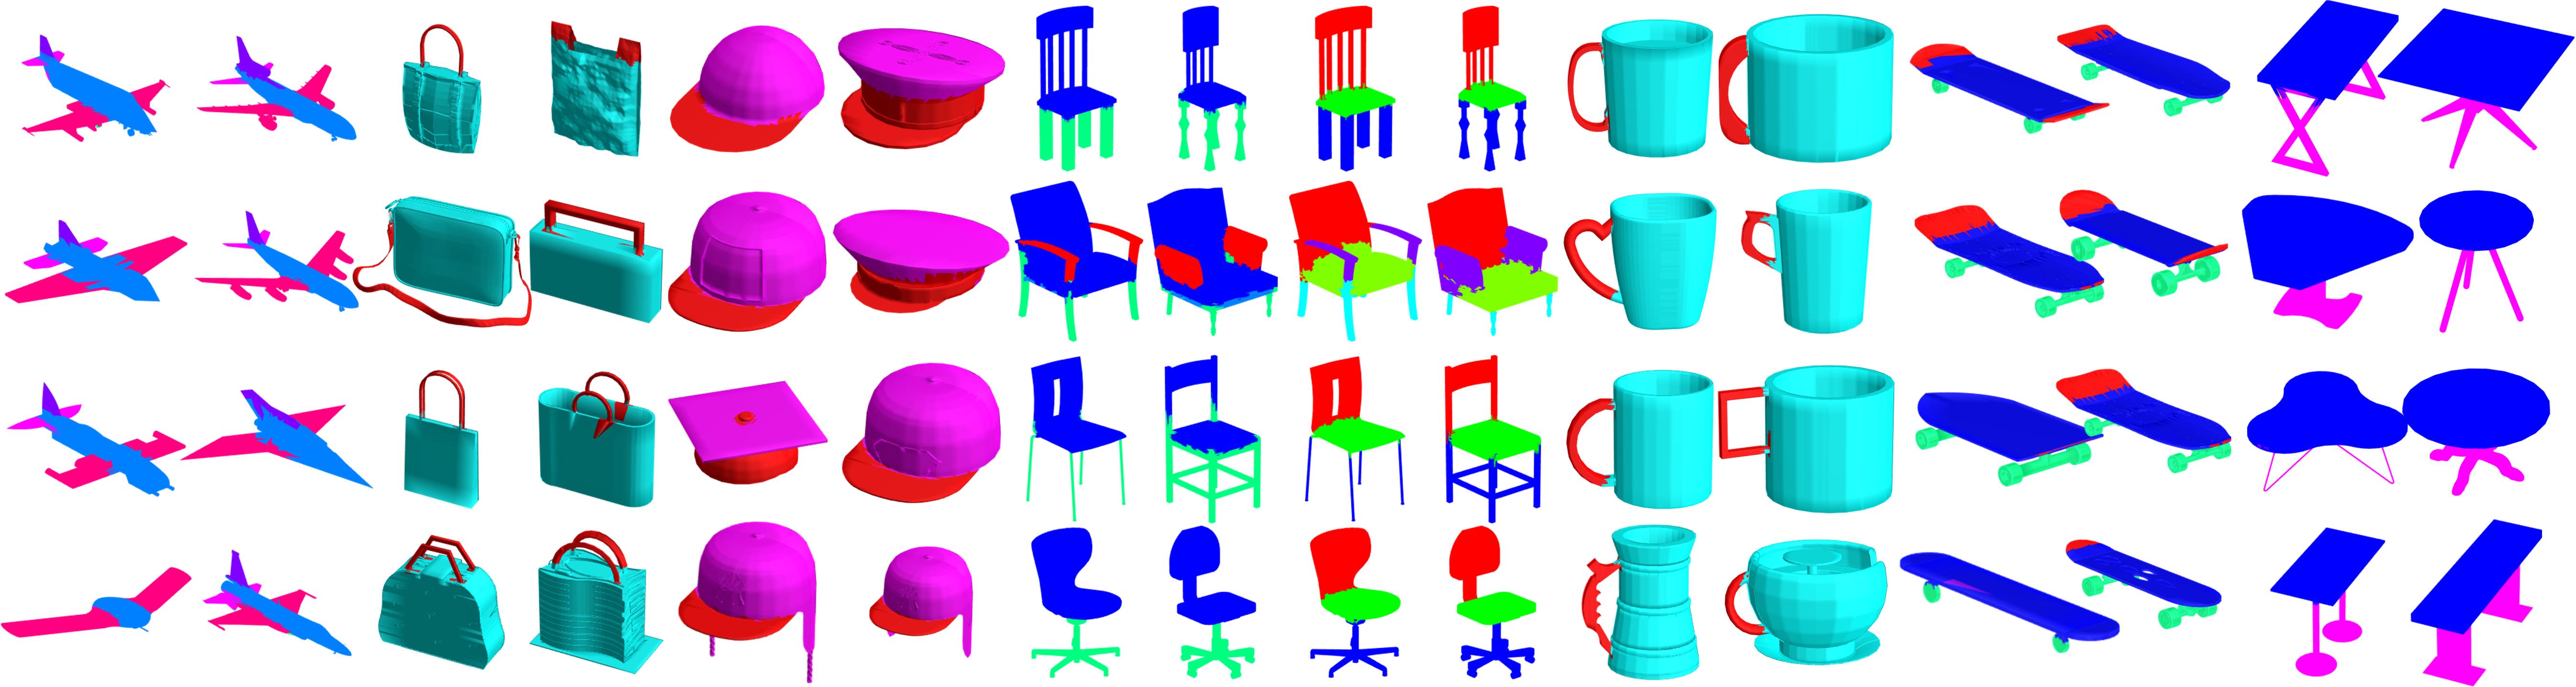 Correspondence 3D Segmentation Examples